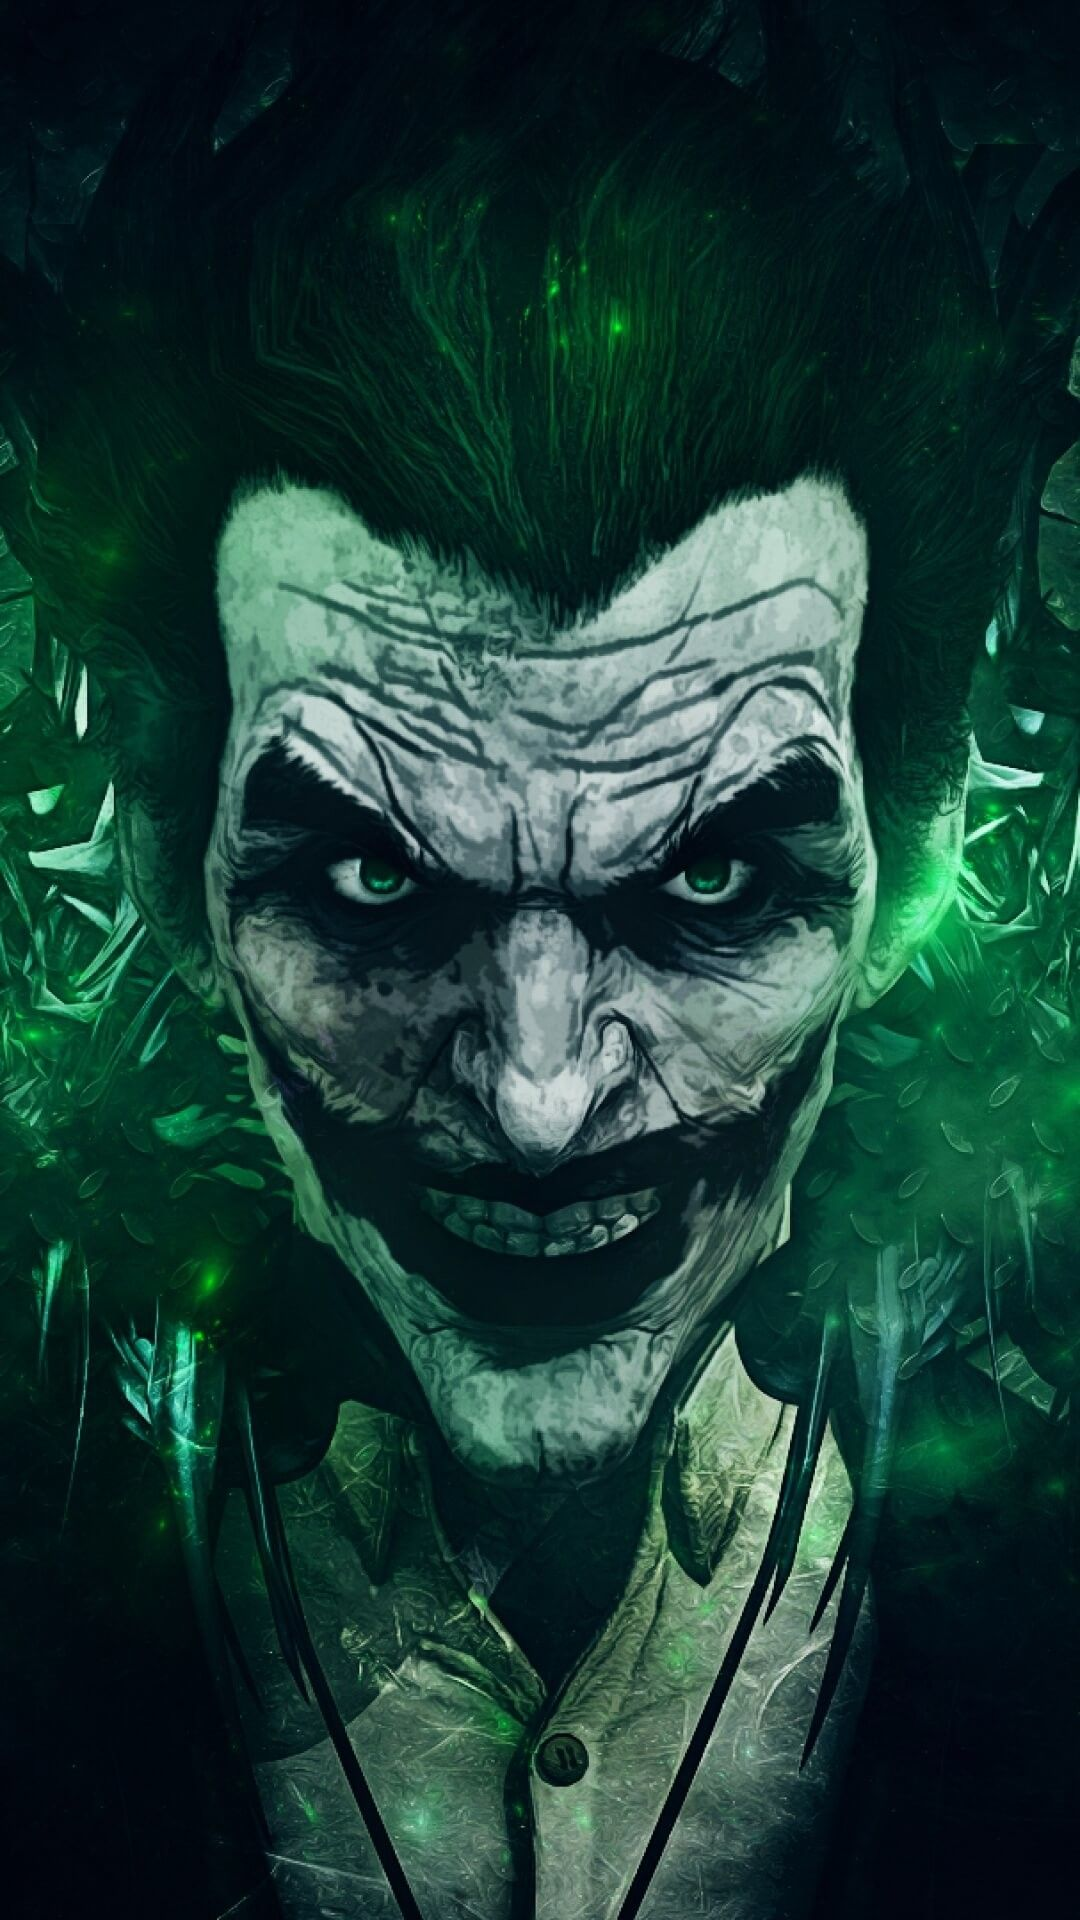 1080x1920 cool iphone wallpaper tumblr454 Joker